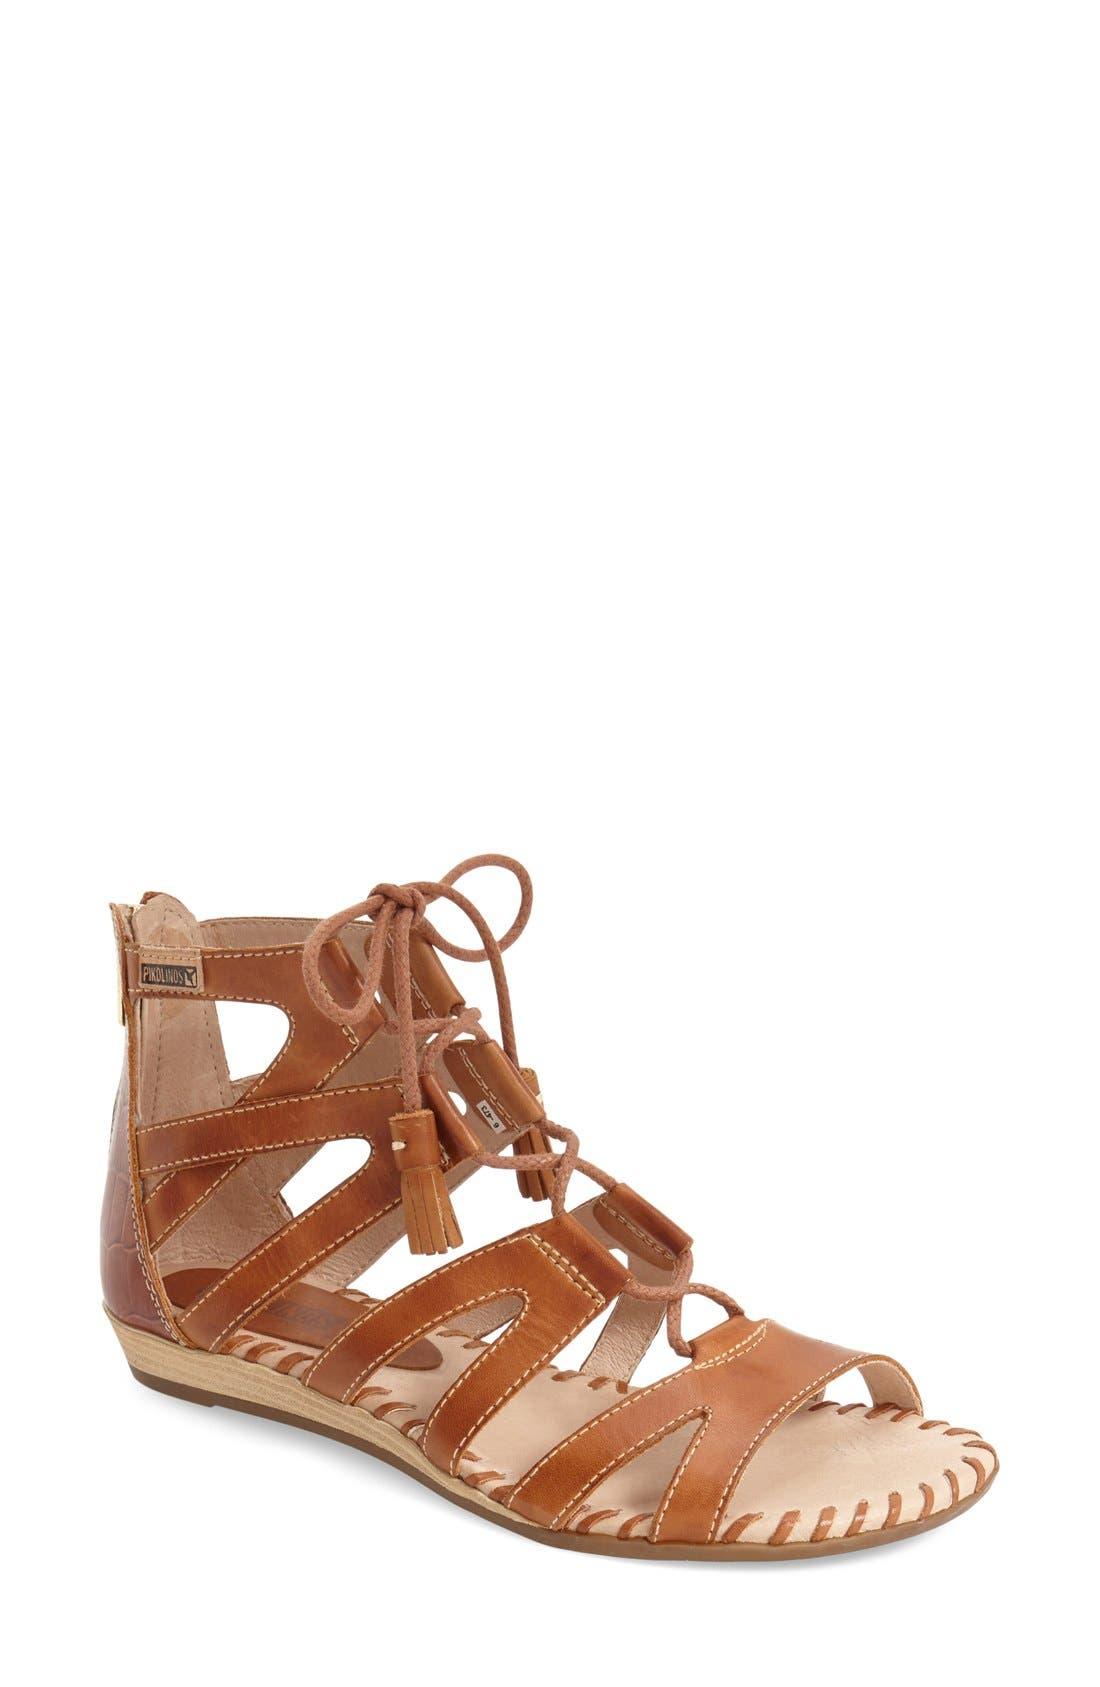 'Alcudia' Lace-Up Sandal,                             Main thumbnail 2, color,